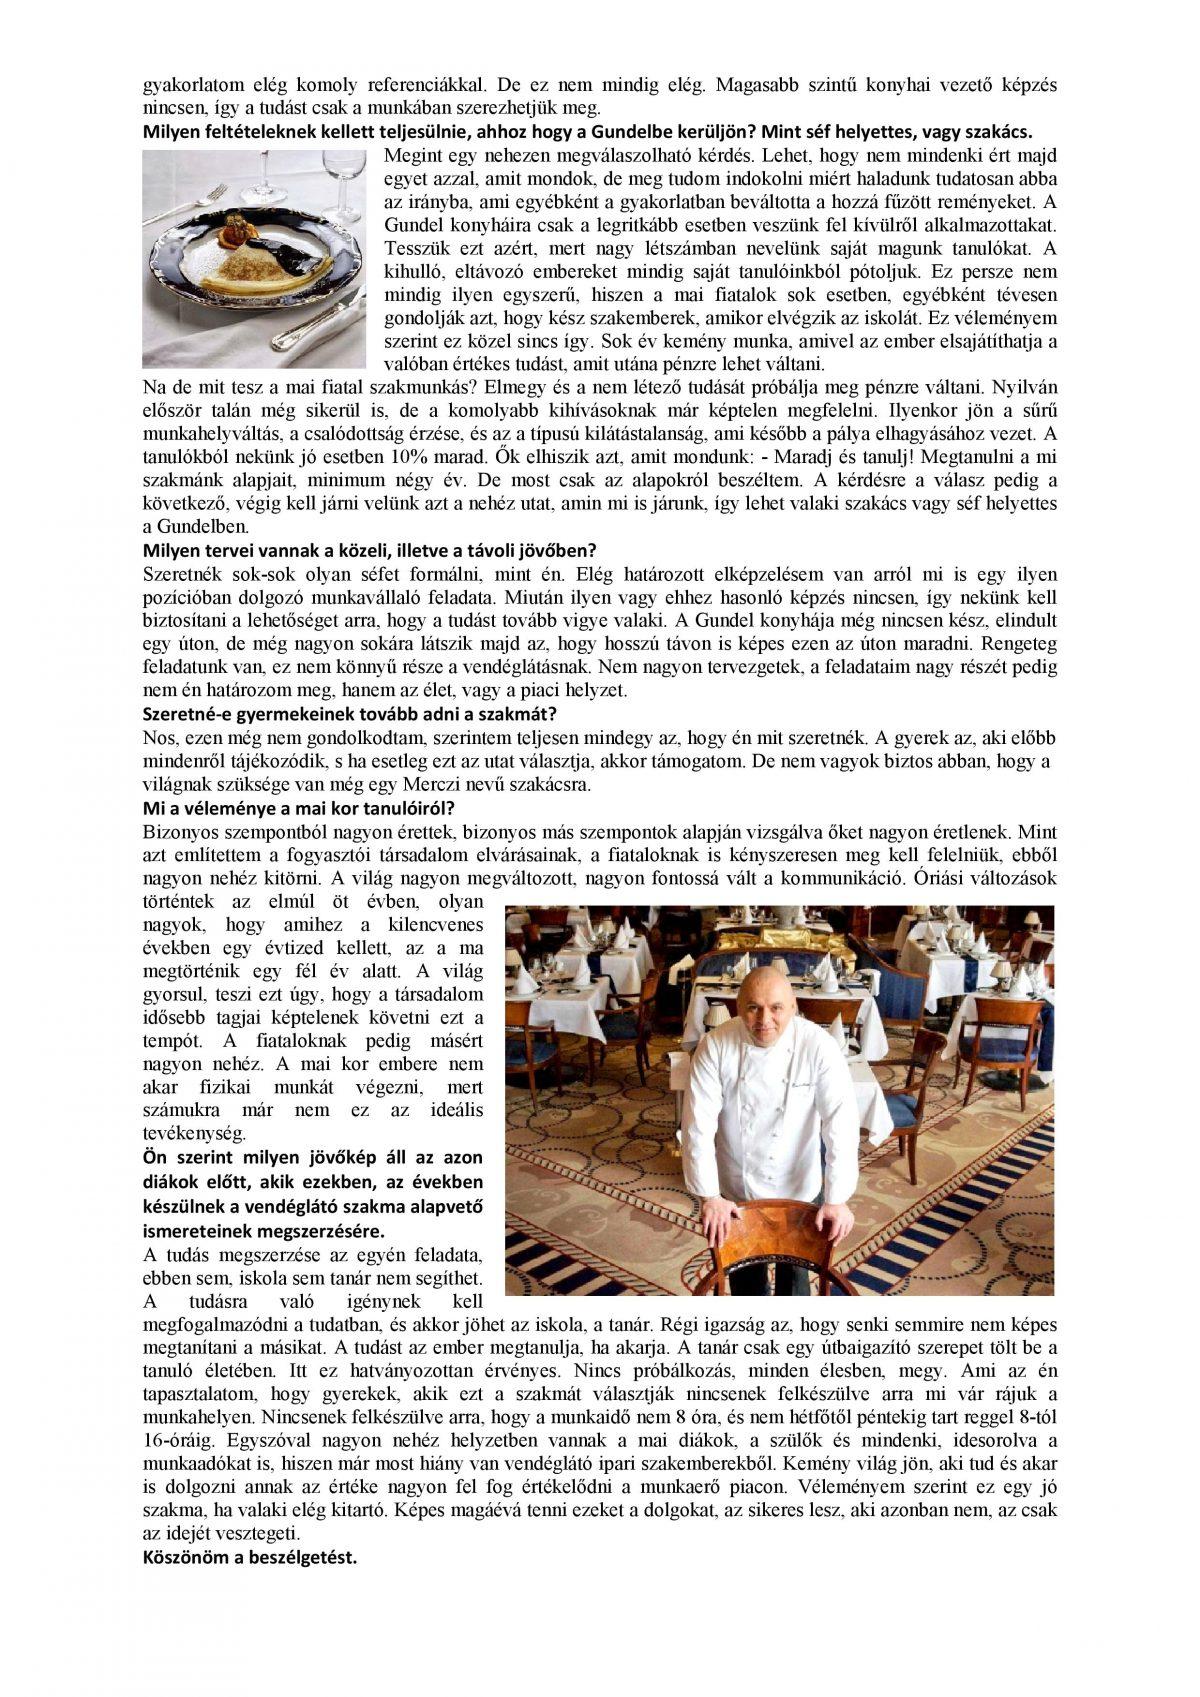 http://mandysuli.bkszc.hu/wp-content/uploads/2016/09/11.-oldal-page-002-1200x1697.jpg